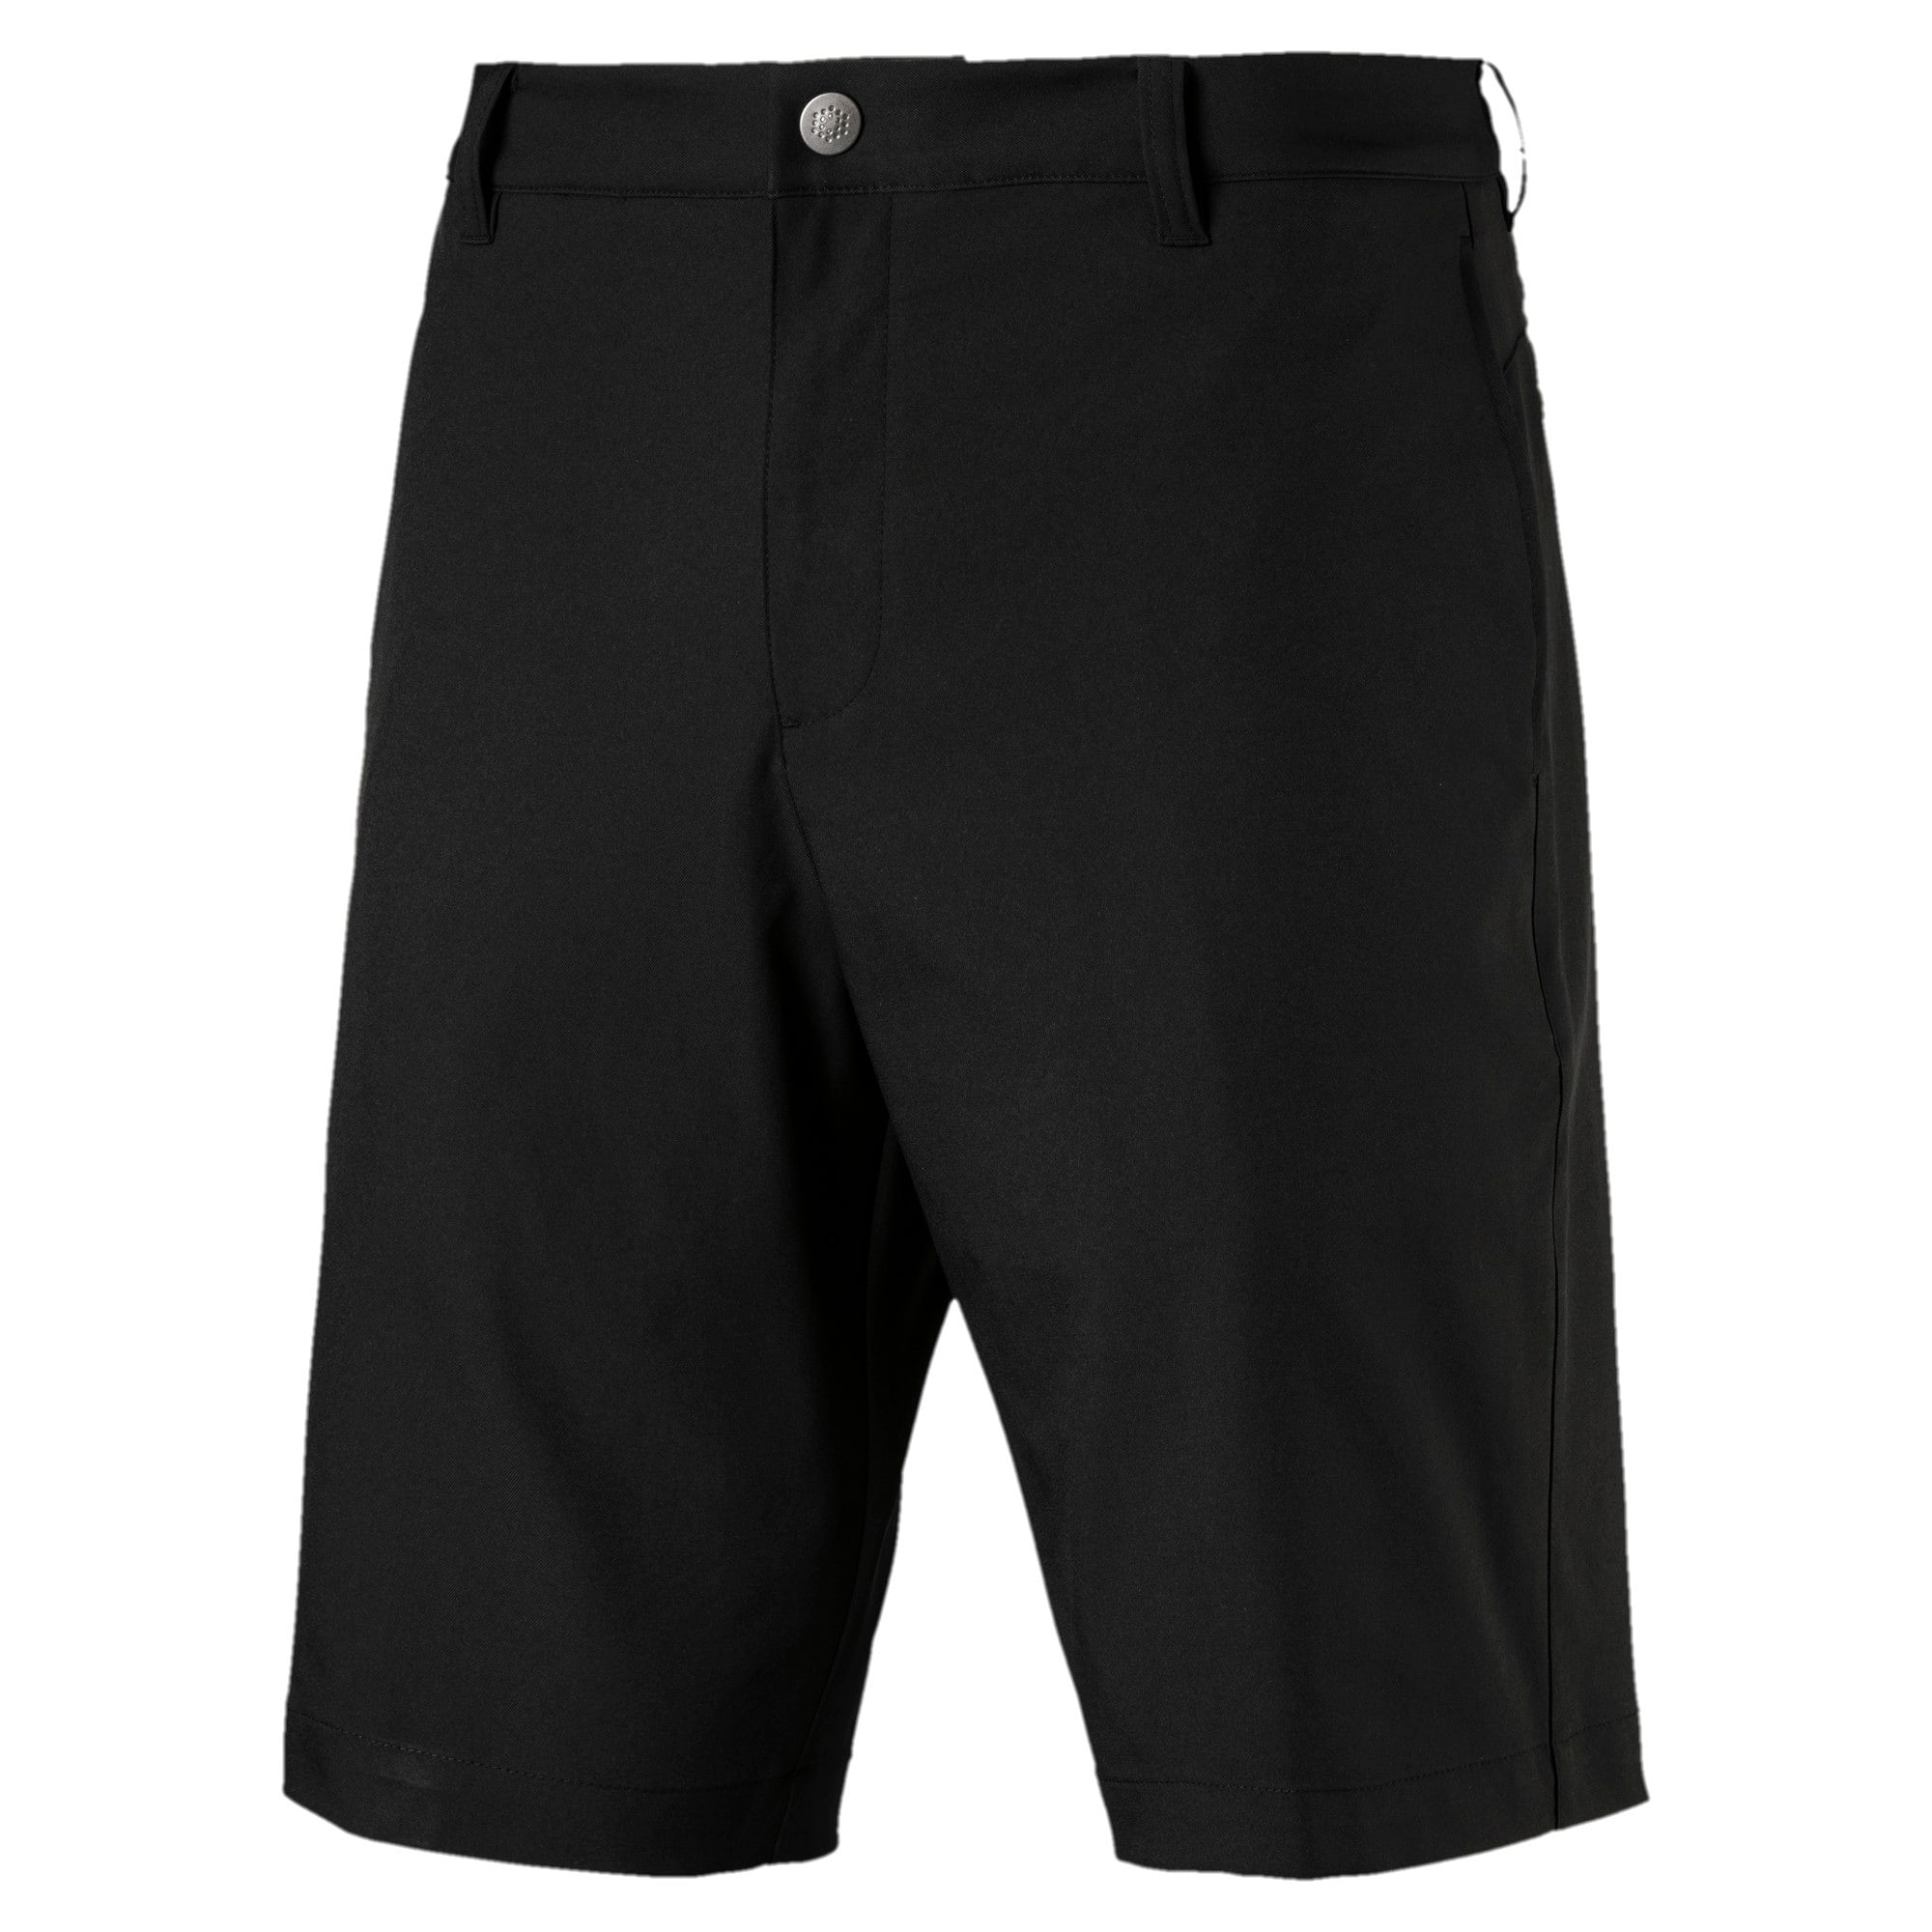 Thumbnail 1 of Jackpot Men's Shorts, Puma Black, medium